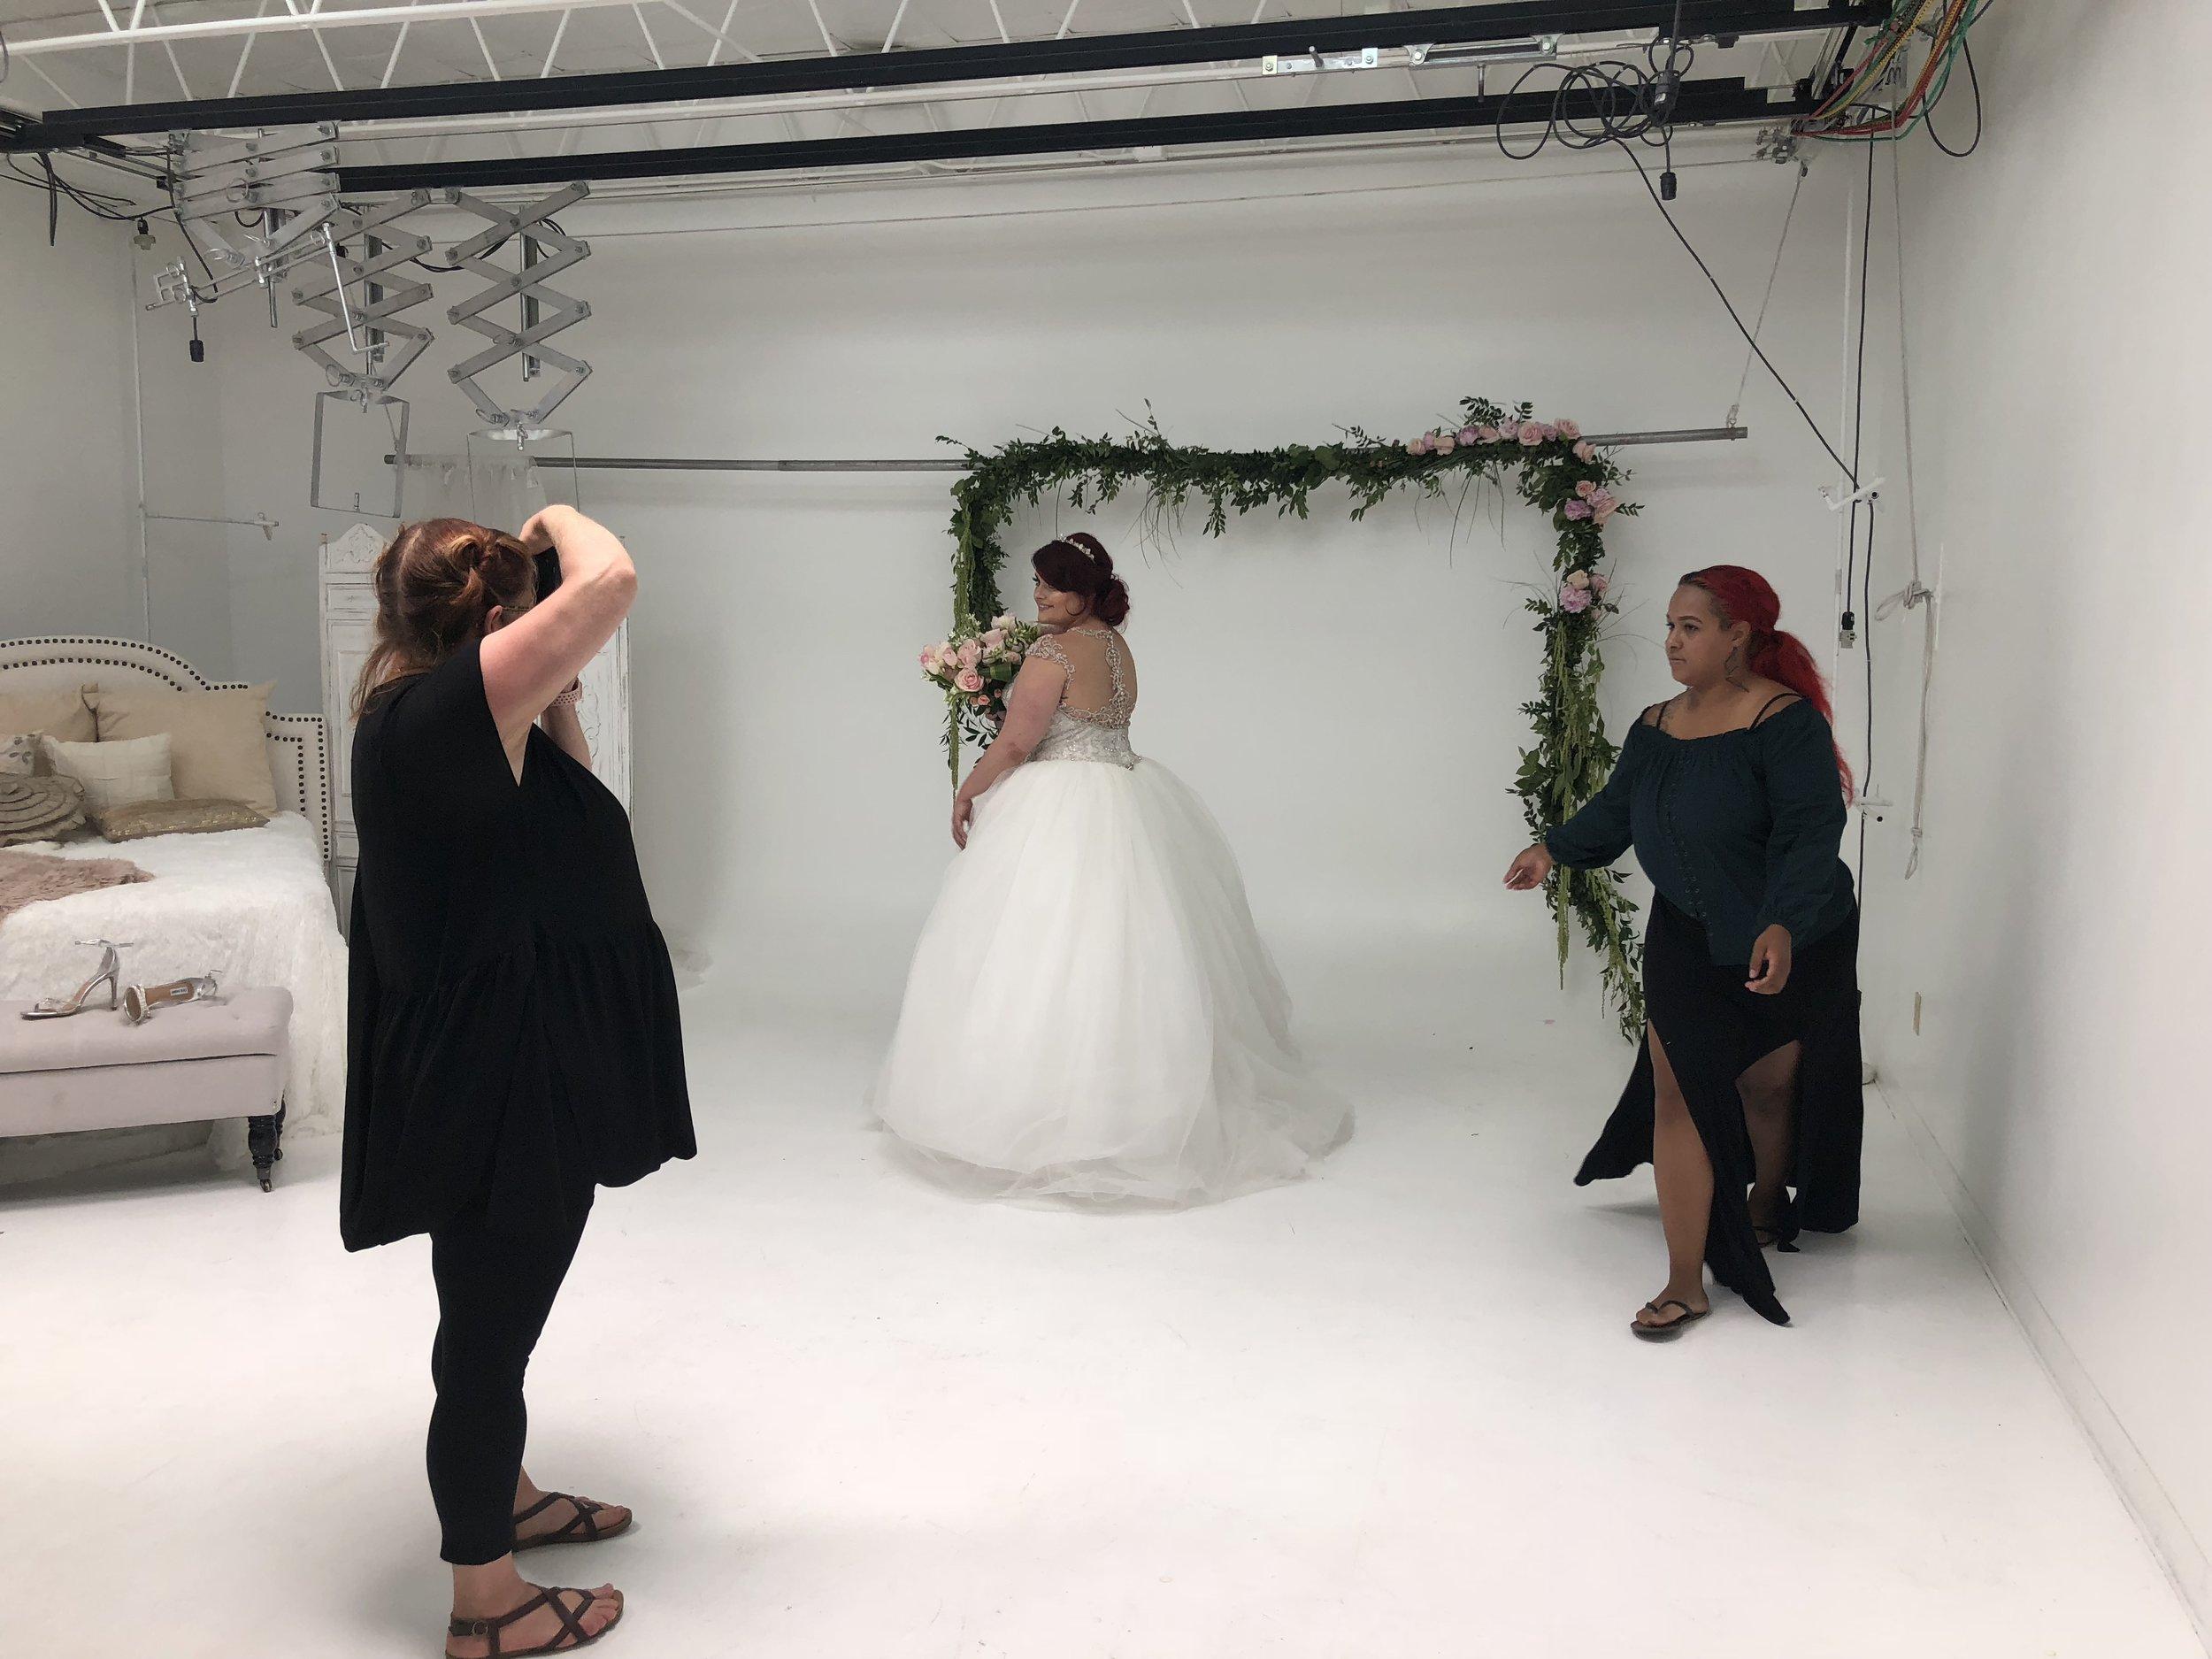 uptown Bride fashion shoot 5.jpg